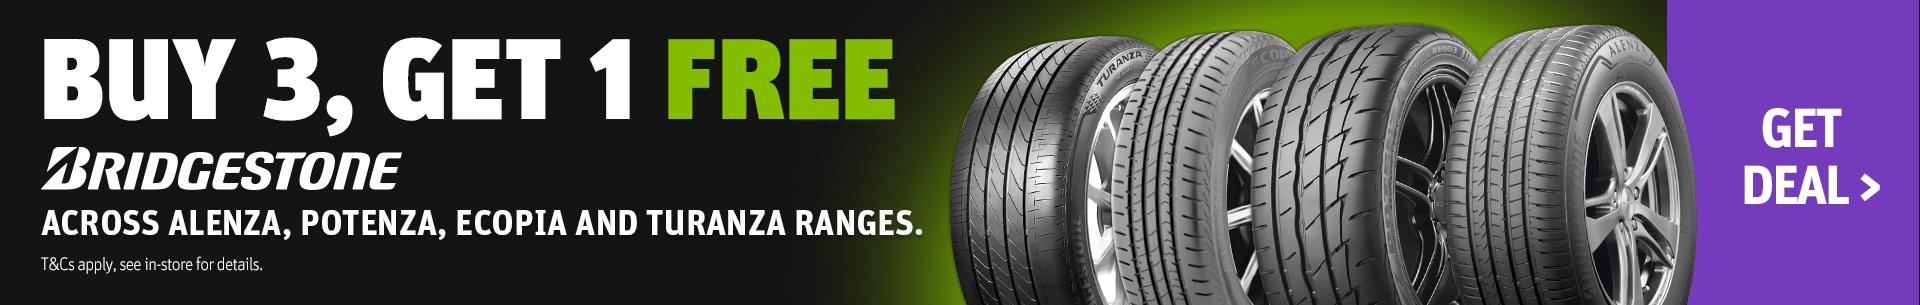 Buy 3 Get 1 Free Bridgestone Tyres